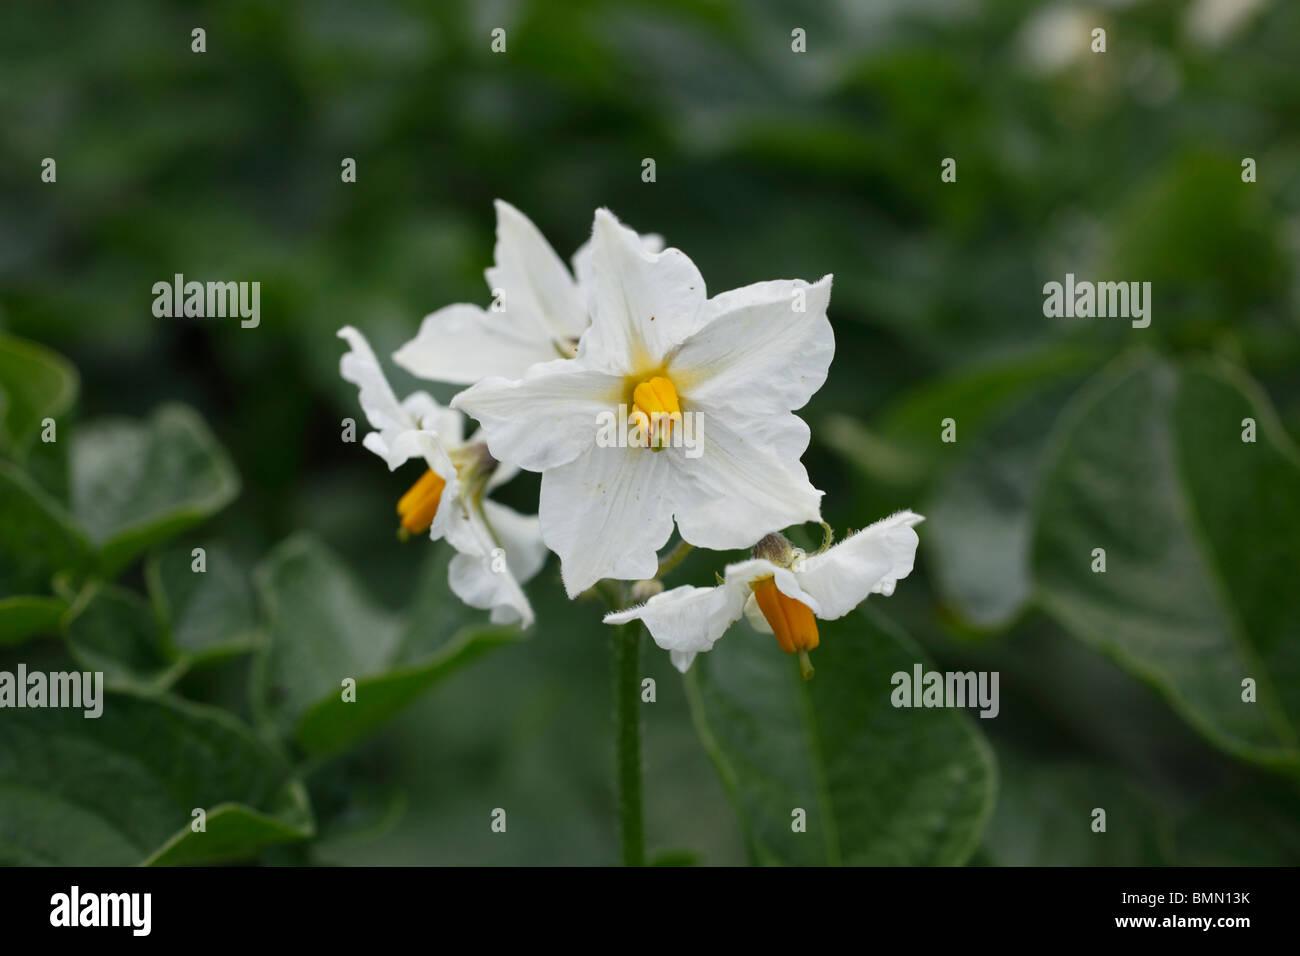 Potato Maris bard close up of flower - Stock Image